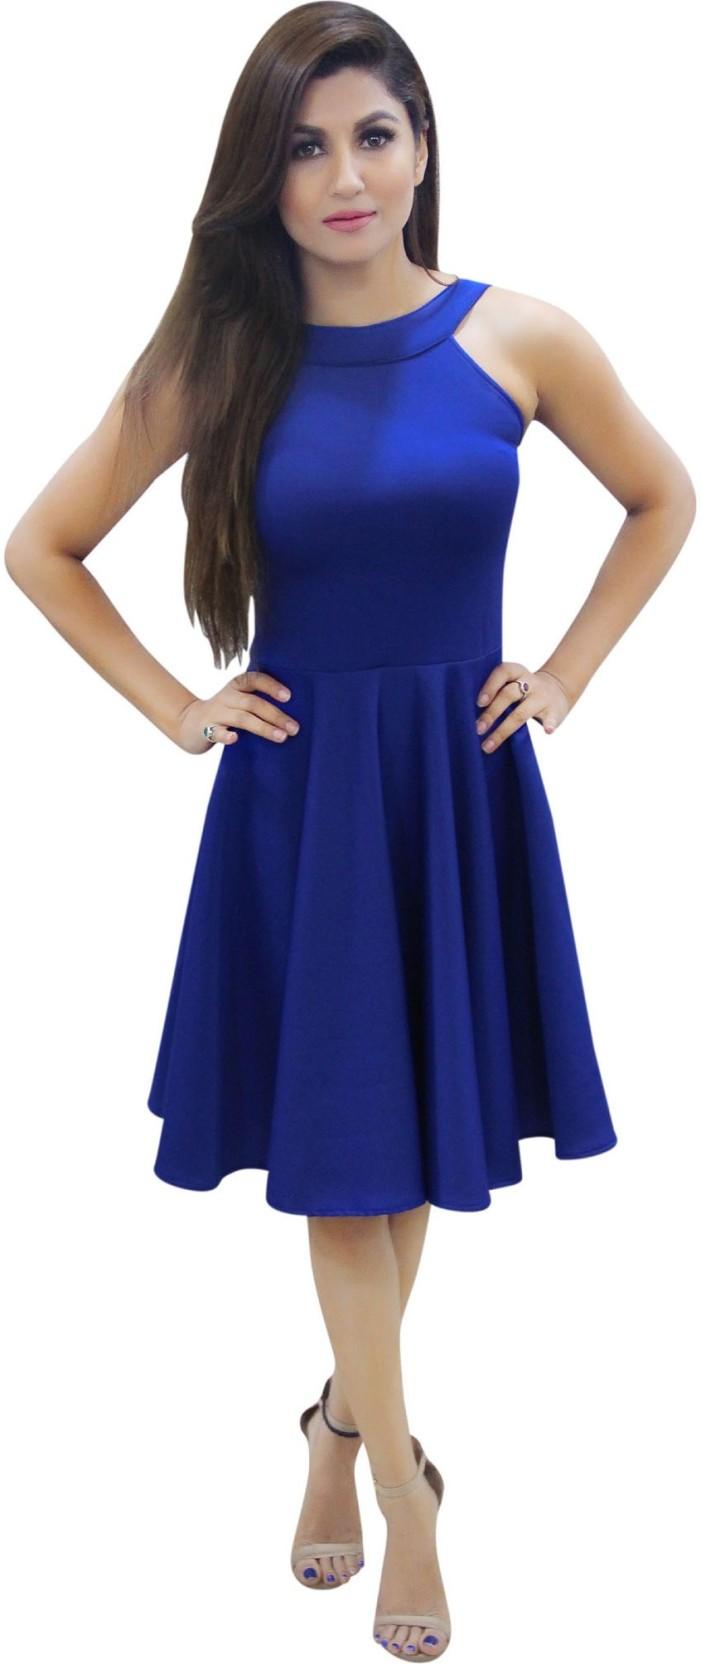 Crazevilla Women Skater Blue Dress Buy Fiction Peplum Purple Add To Cart